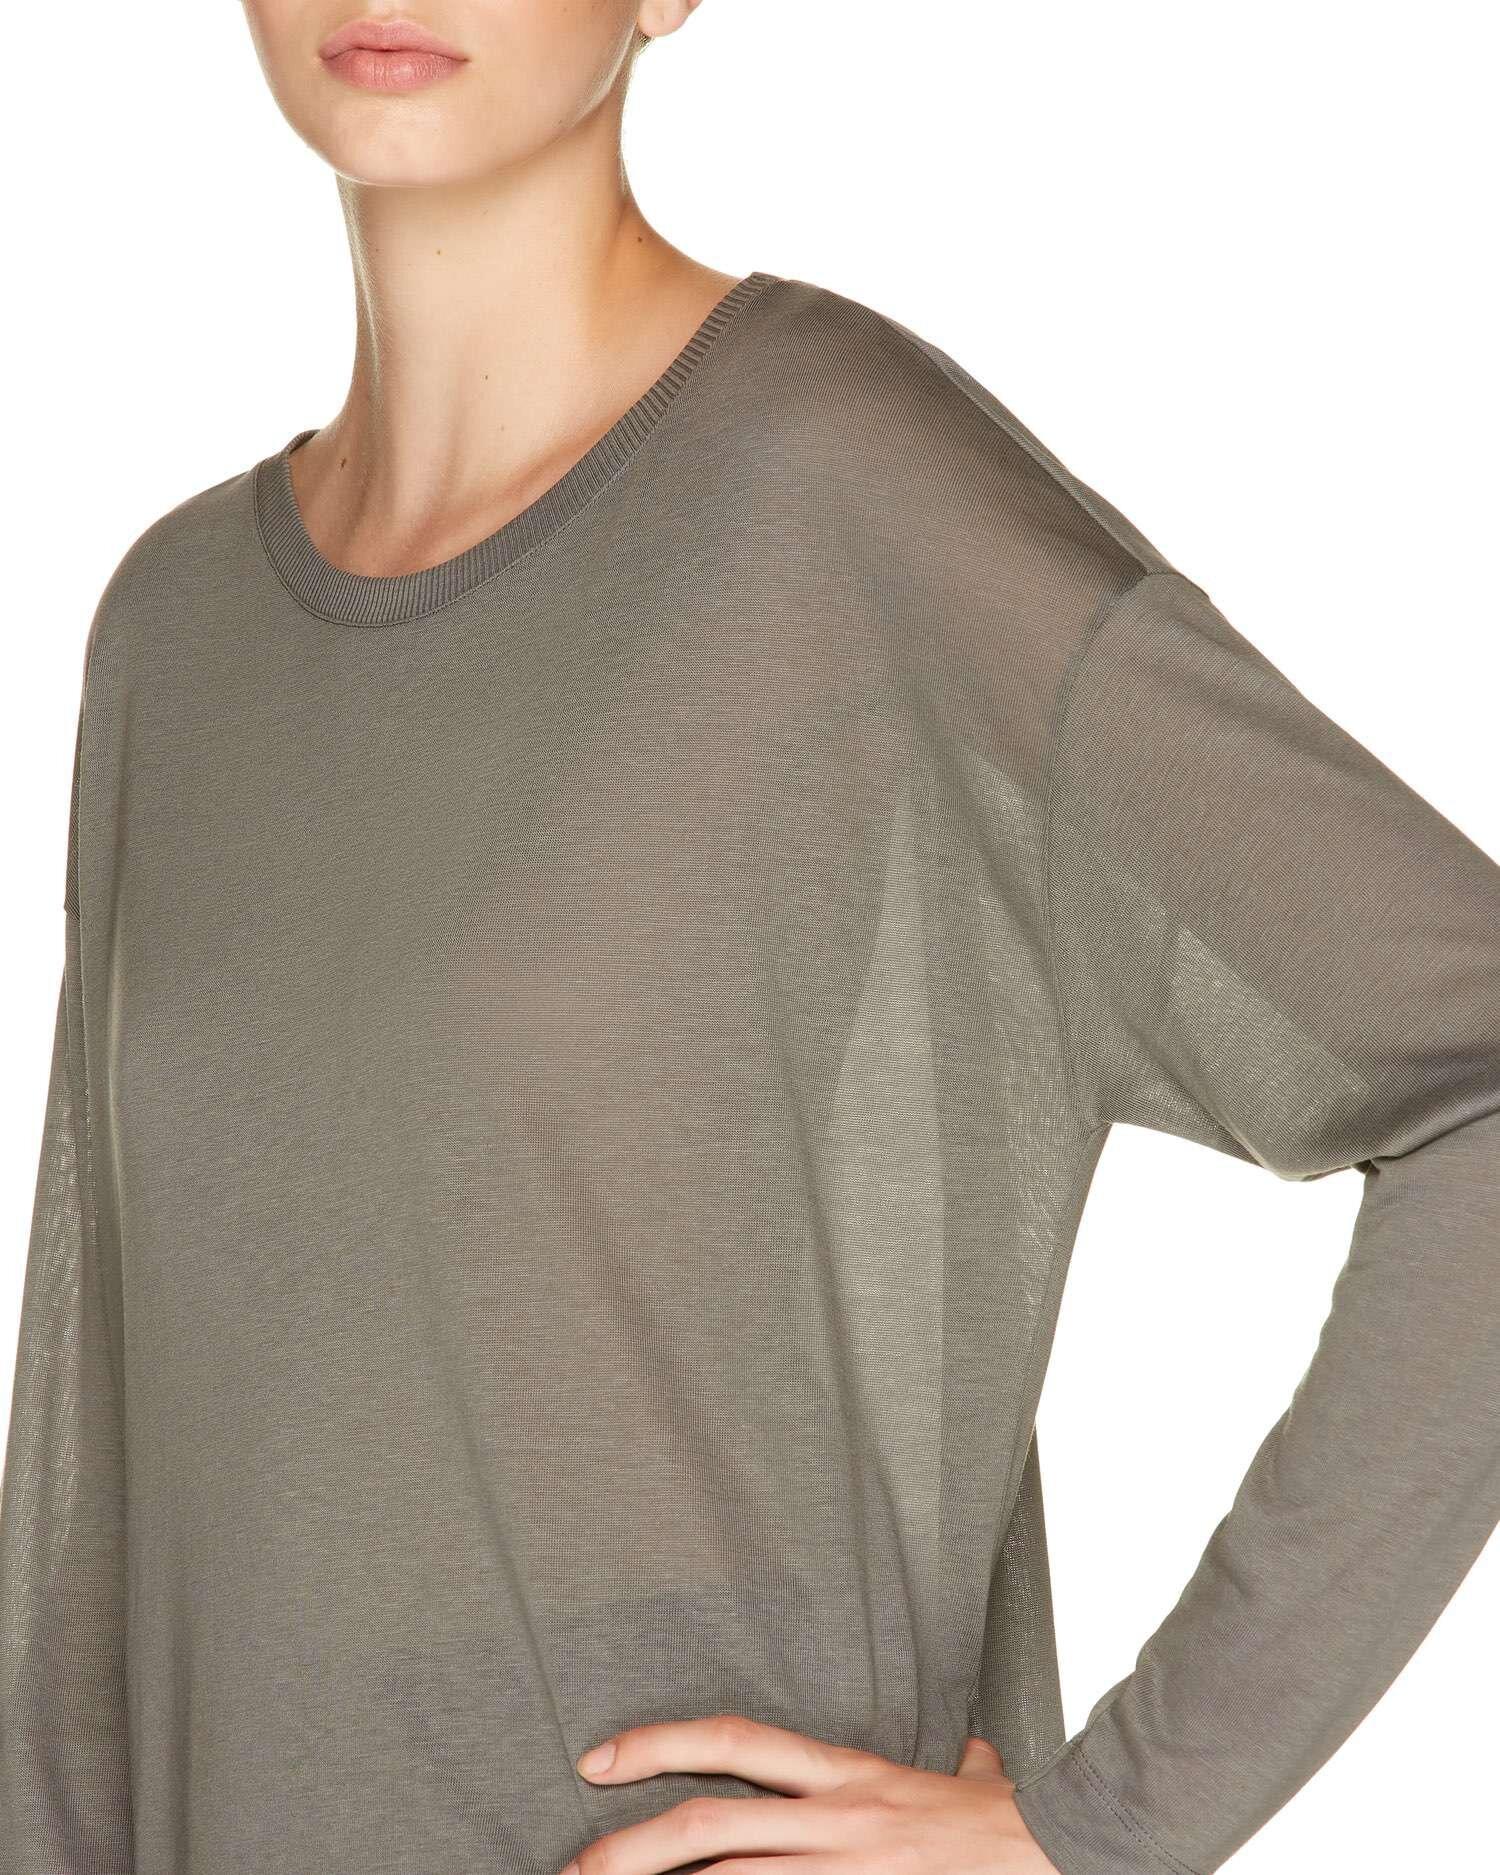 Liyosel-Koton Dökümlü T-shirt